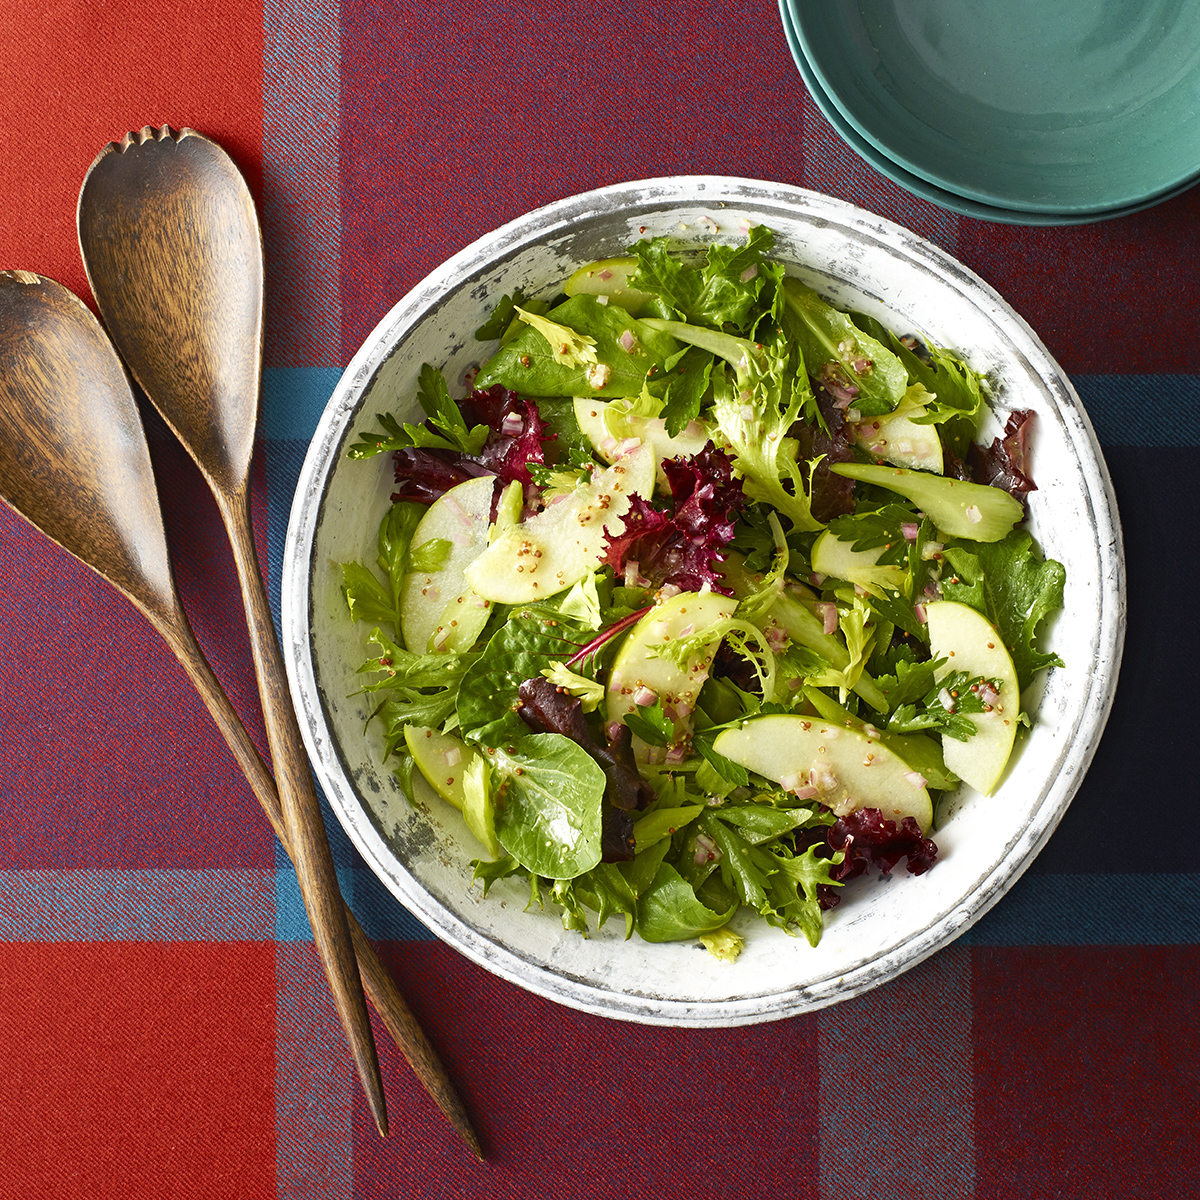 sweet and savory winter salad